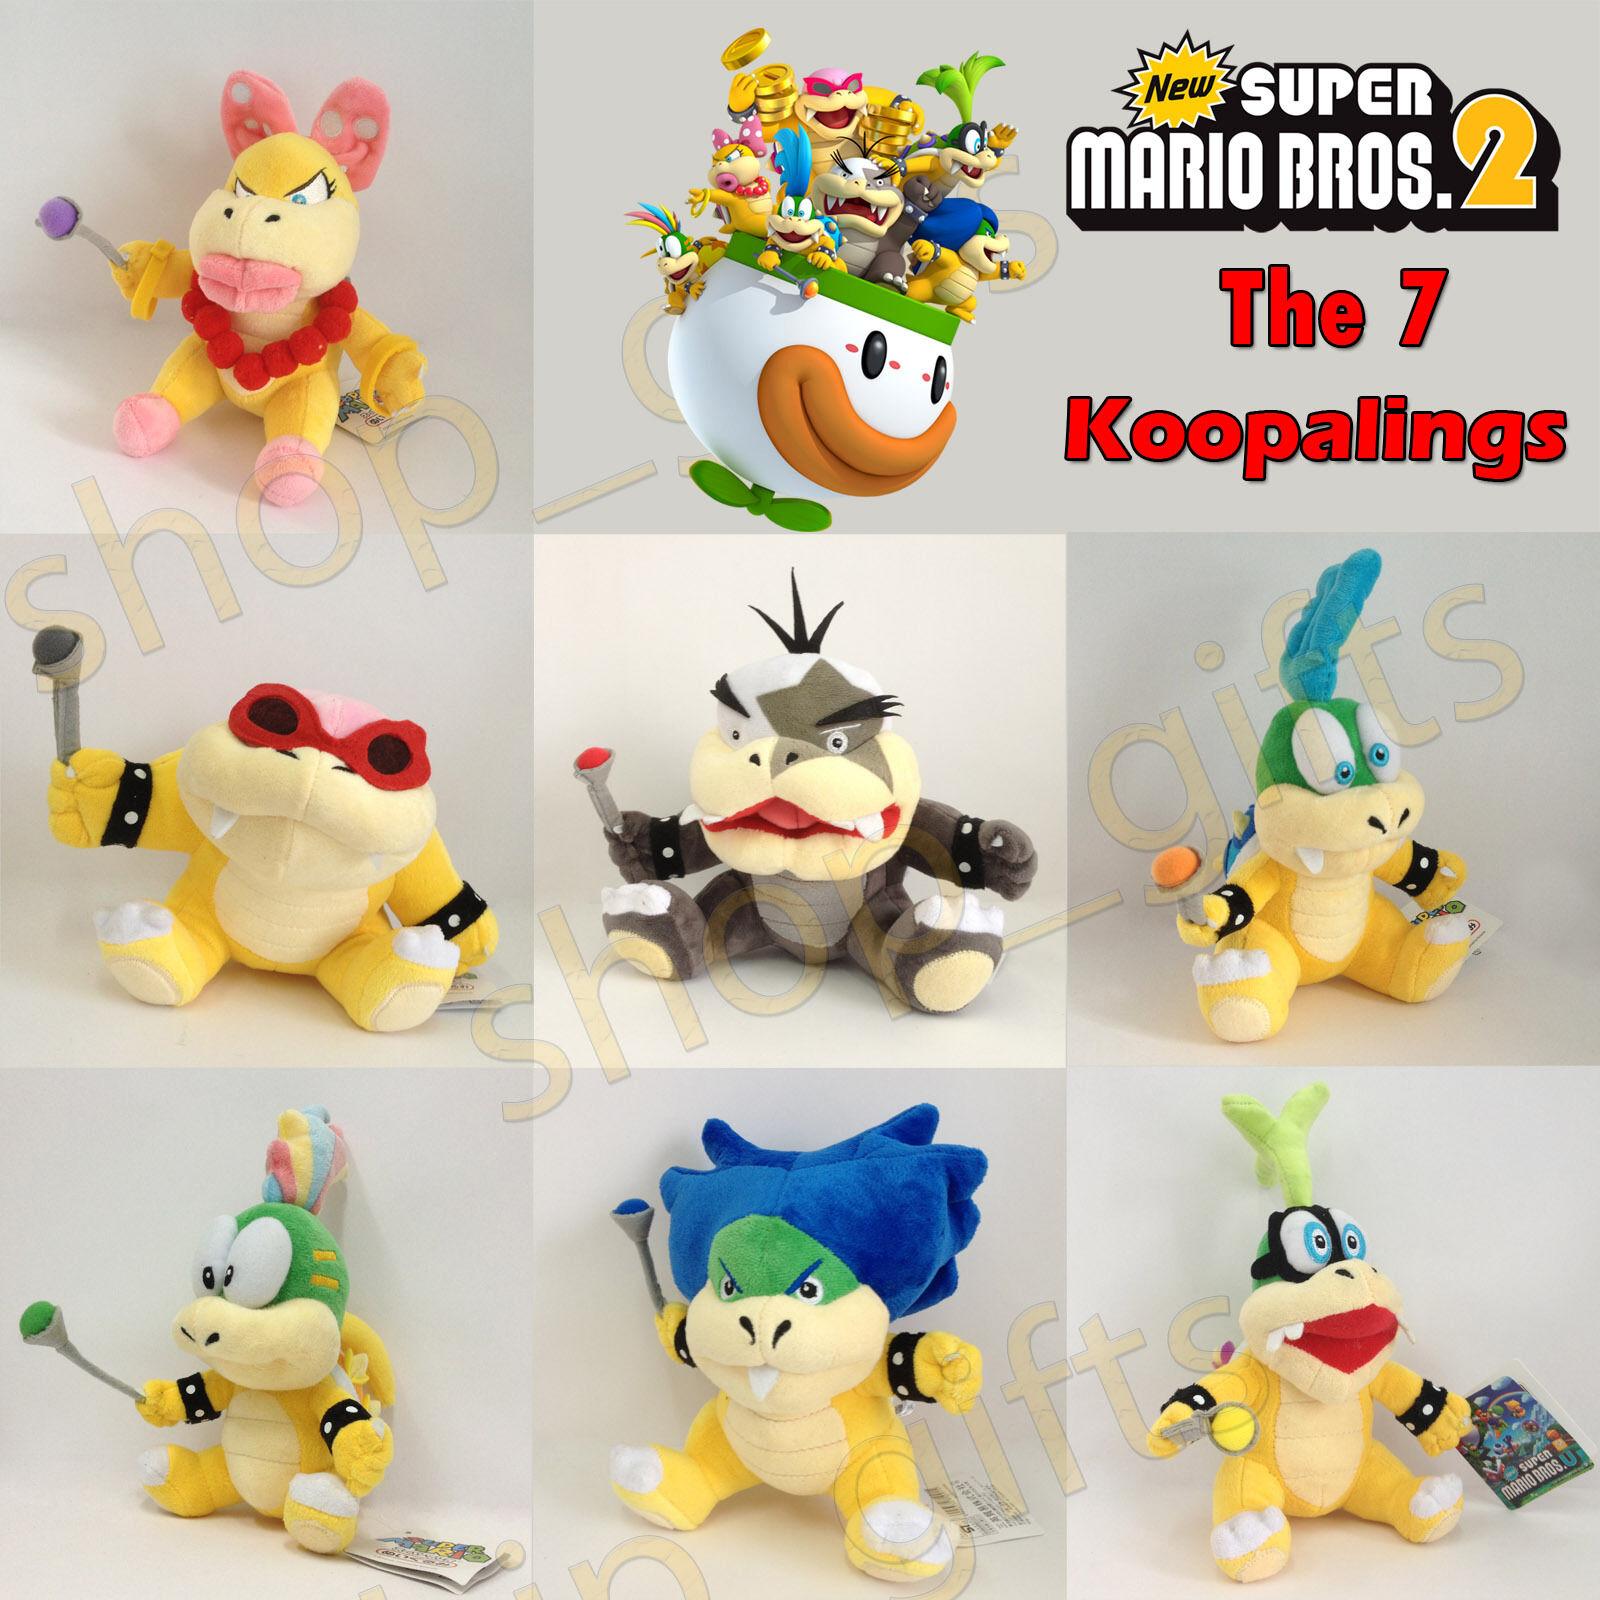 7 Super Mario Bros, 2 Koopalings Plush Ludwig von Larry Lemmy Koopa mjuk leksak